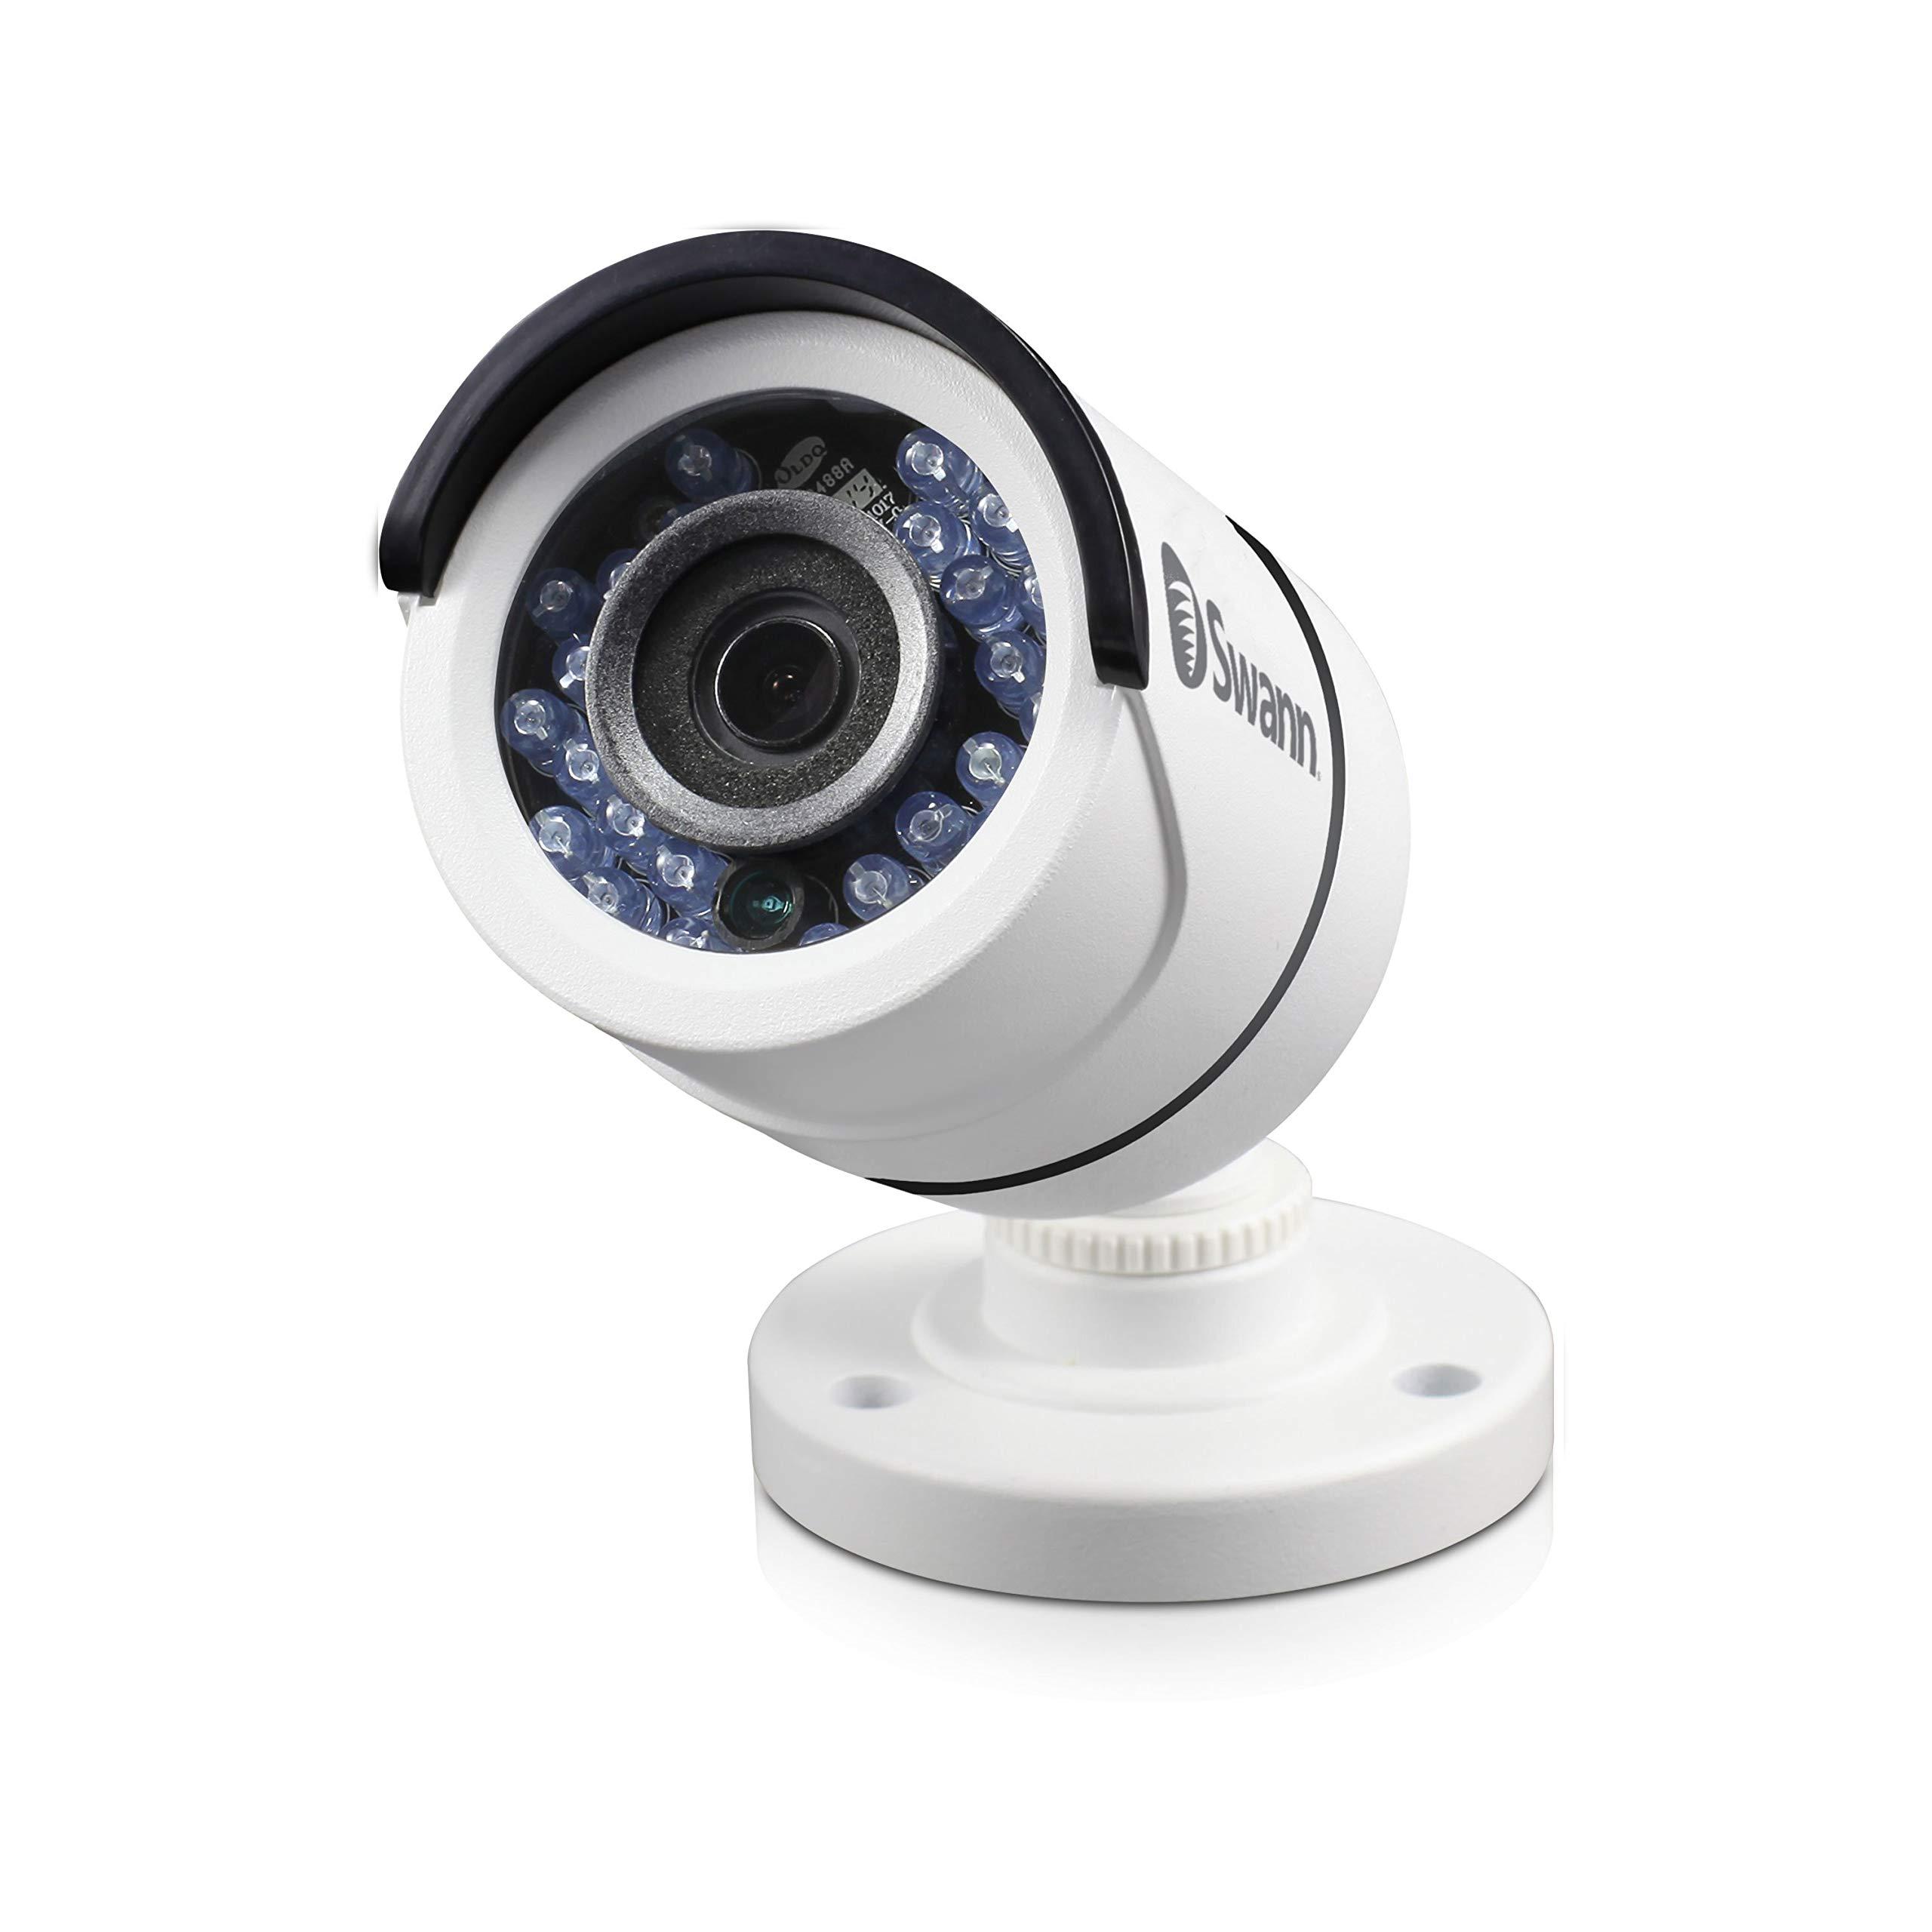 Swann SWPRO-T890CAM-US, Pro-T890 CCTV 5MP TVI White Analog Bullet Camera by Swann